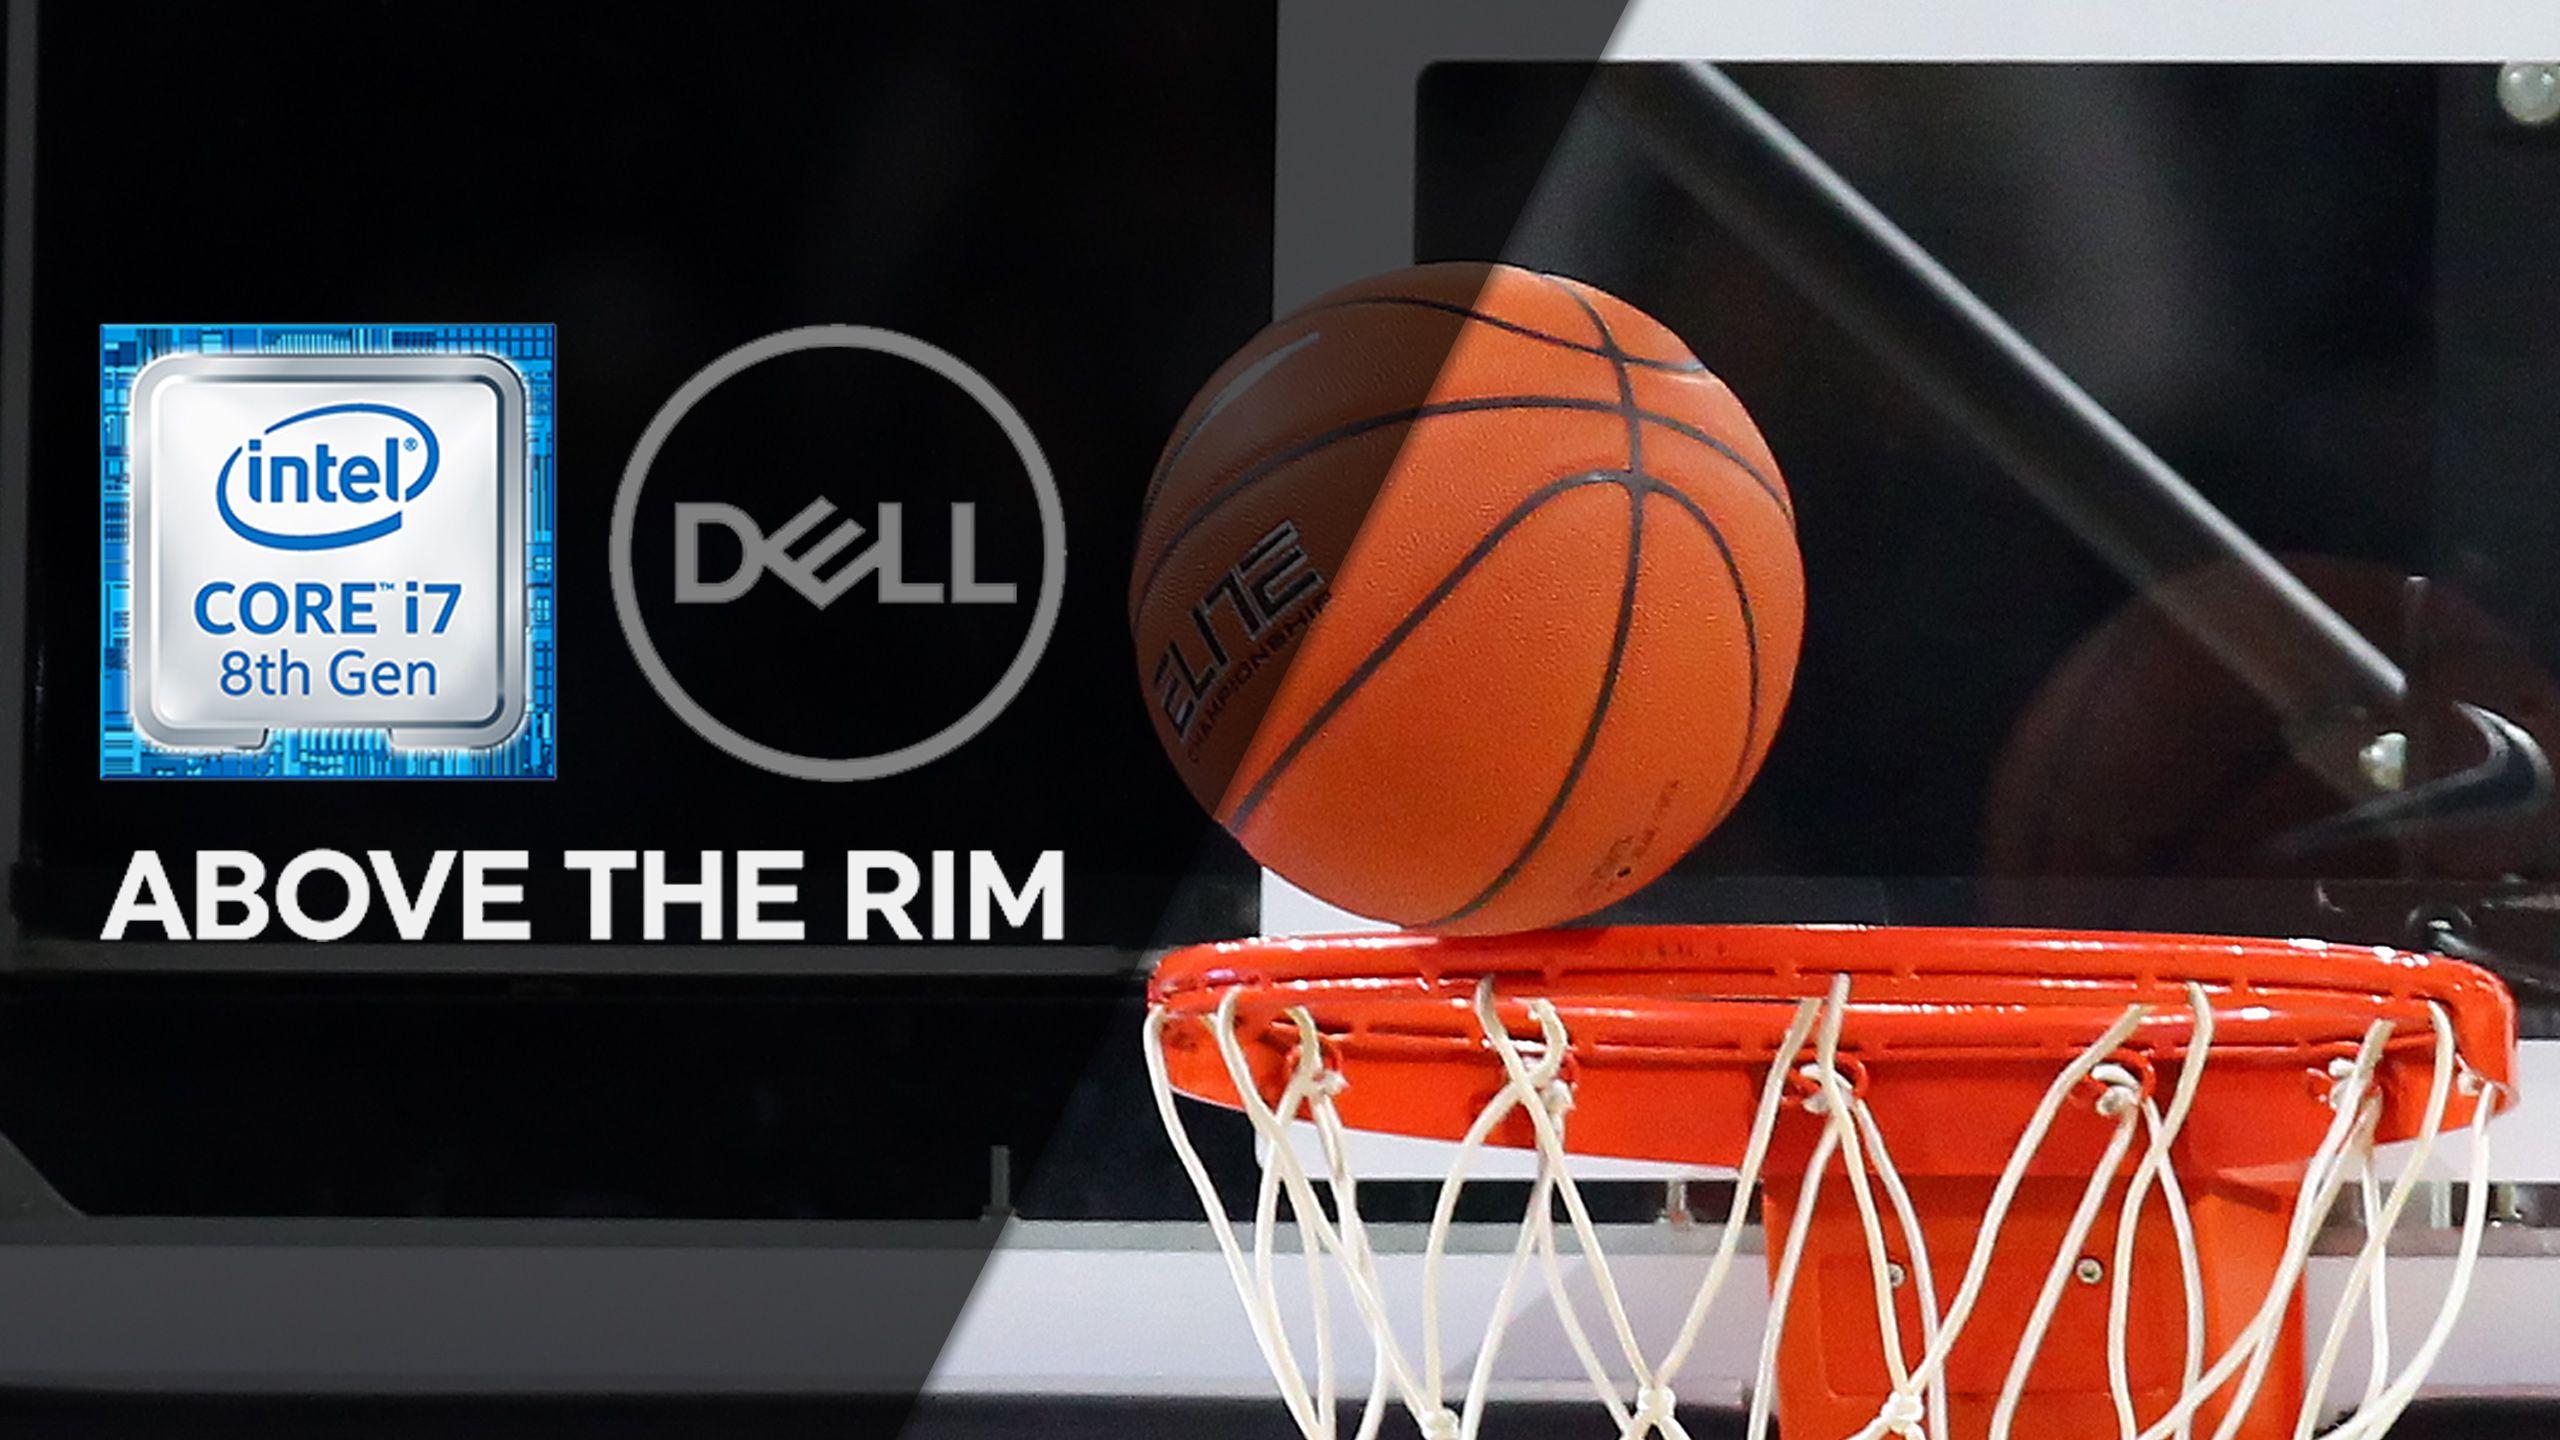 Dell Above the Rim - #20 West Virginia vs. #13 Kansas (M Basketball)